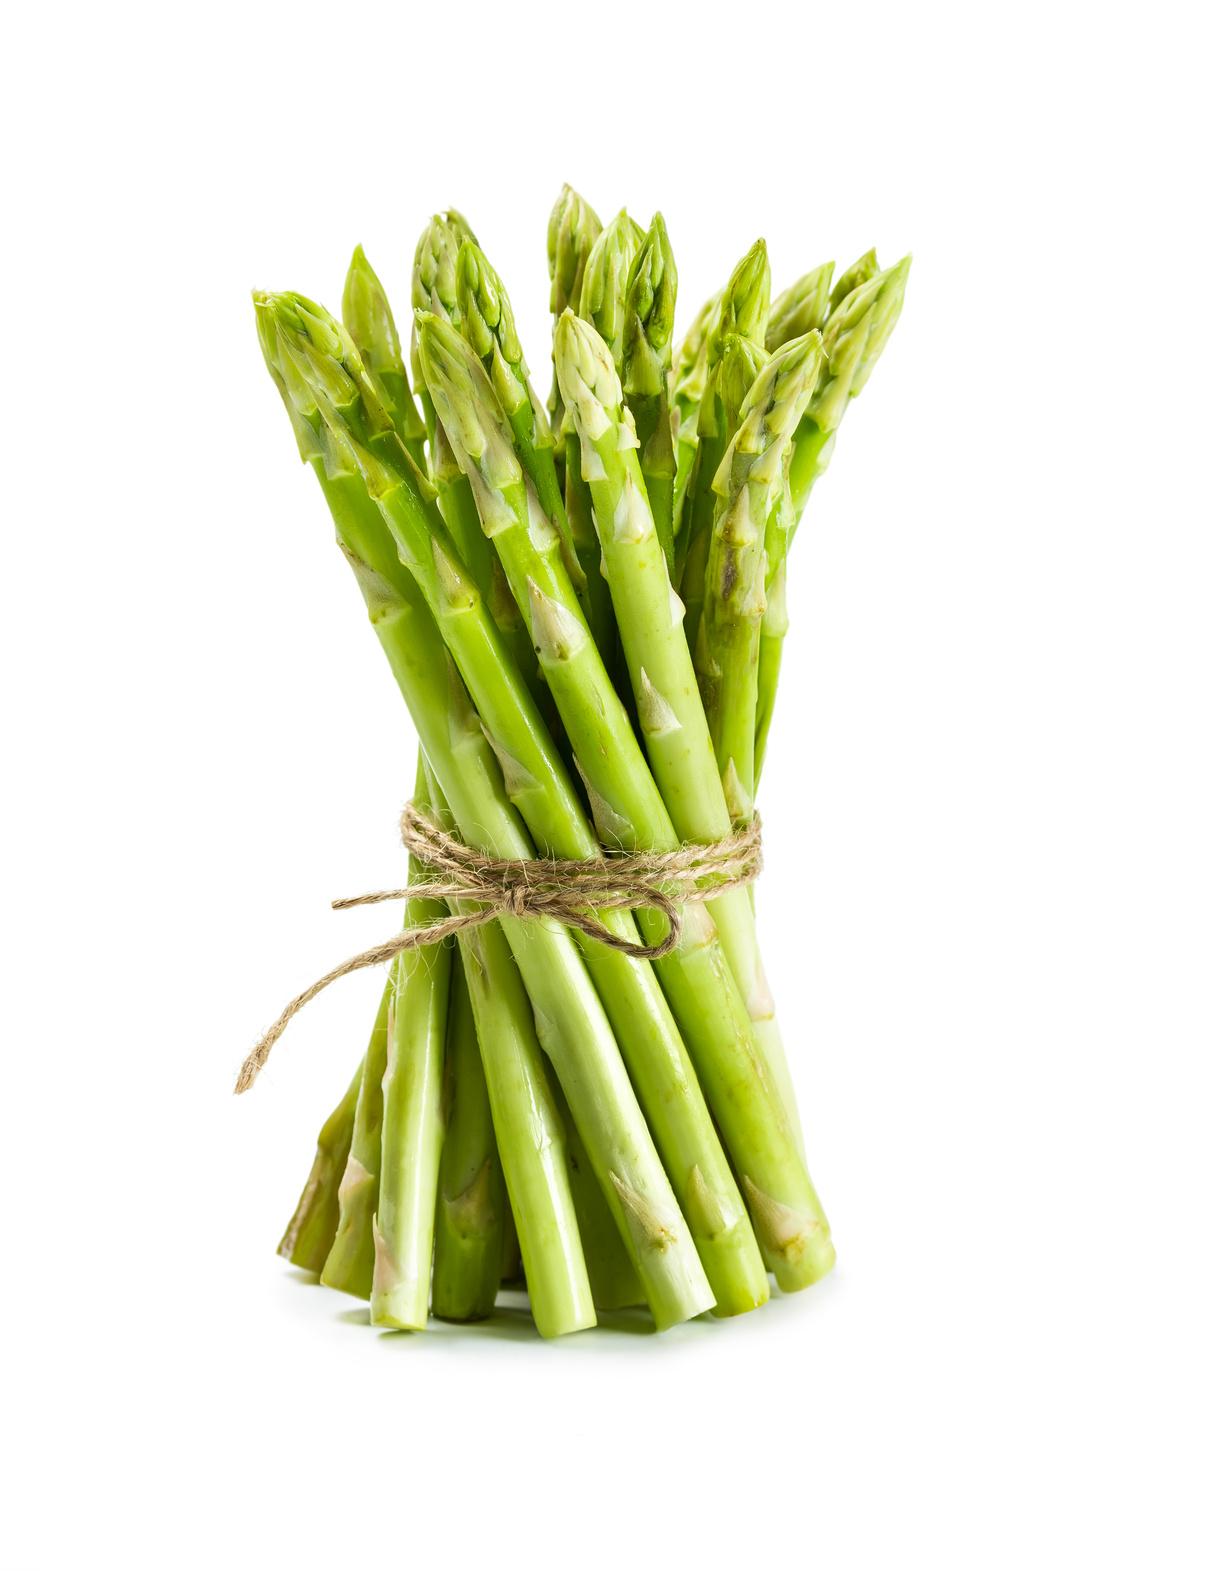 Botte d'asperges vertes import +16 (environ 500 g)